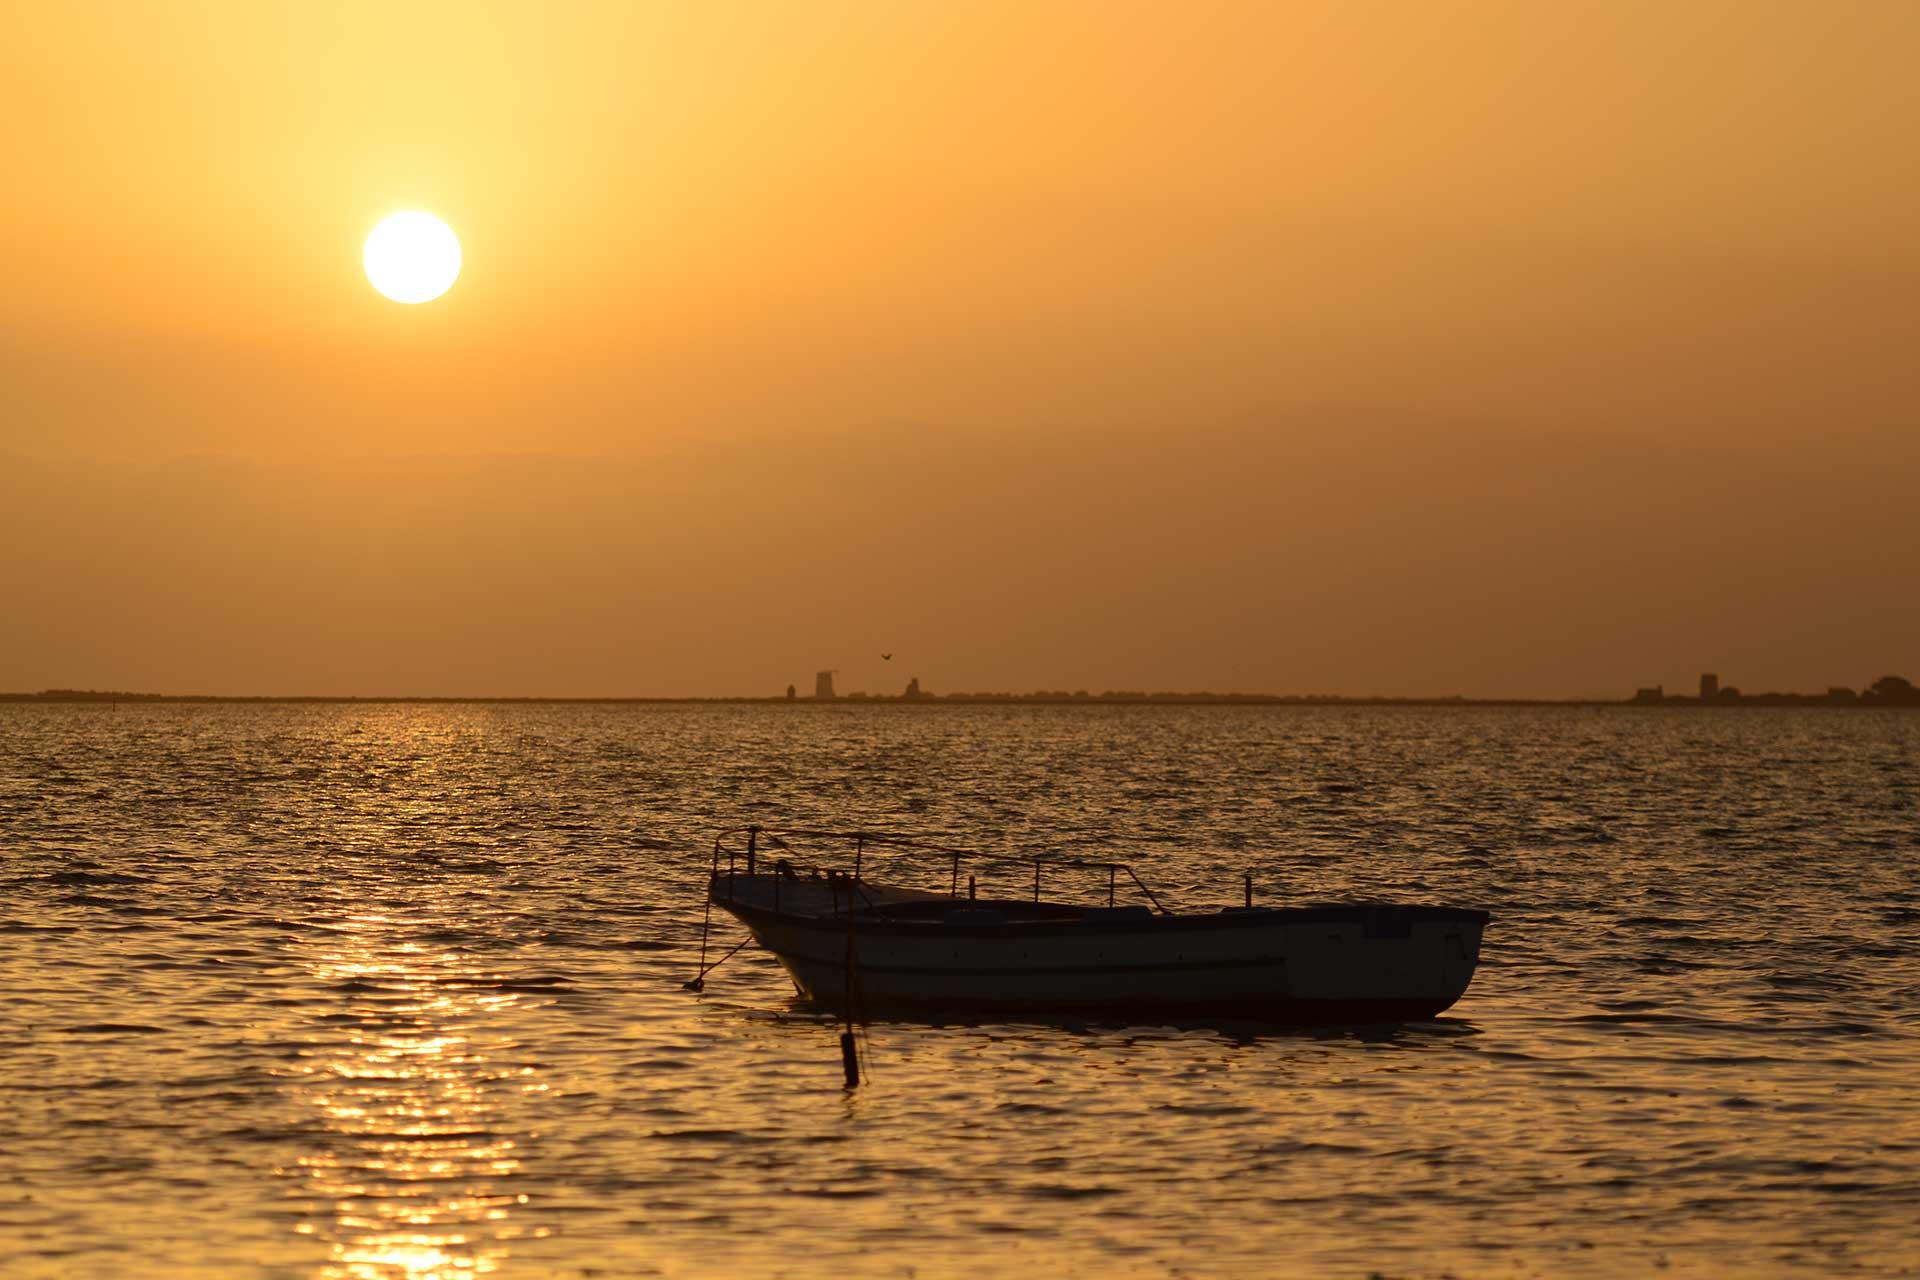 tramonti-laguna-dello-stagnone-kitesurf-05